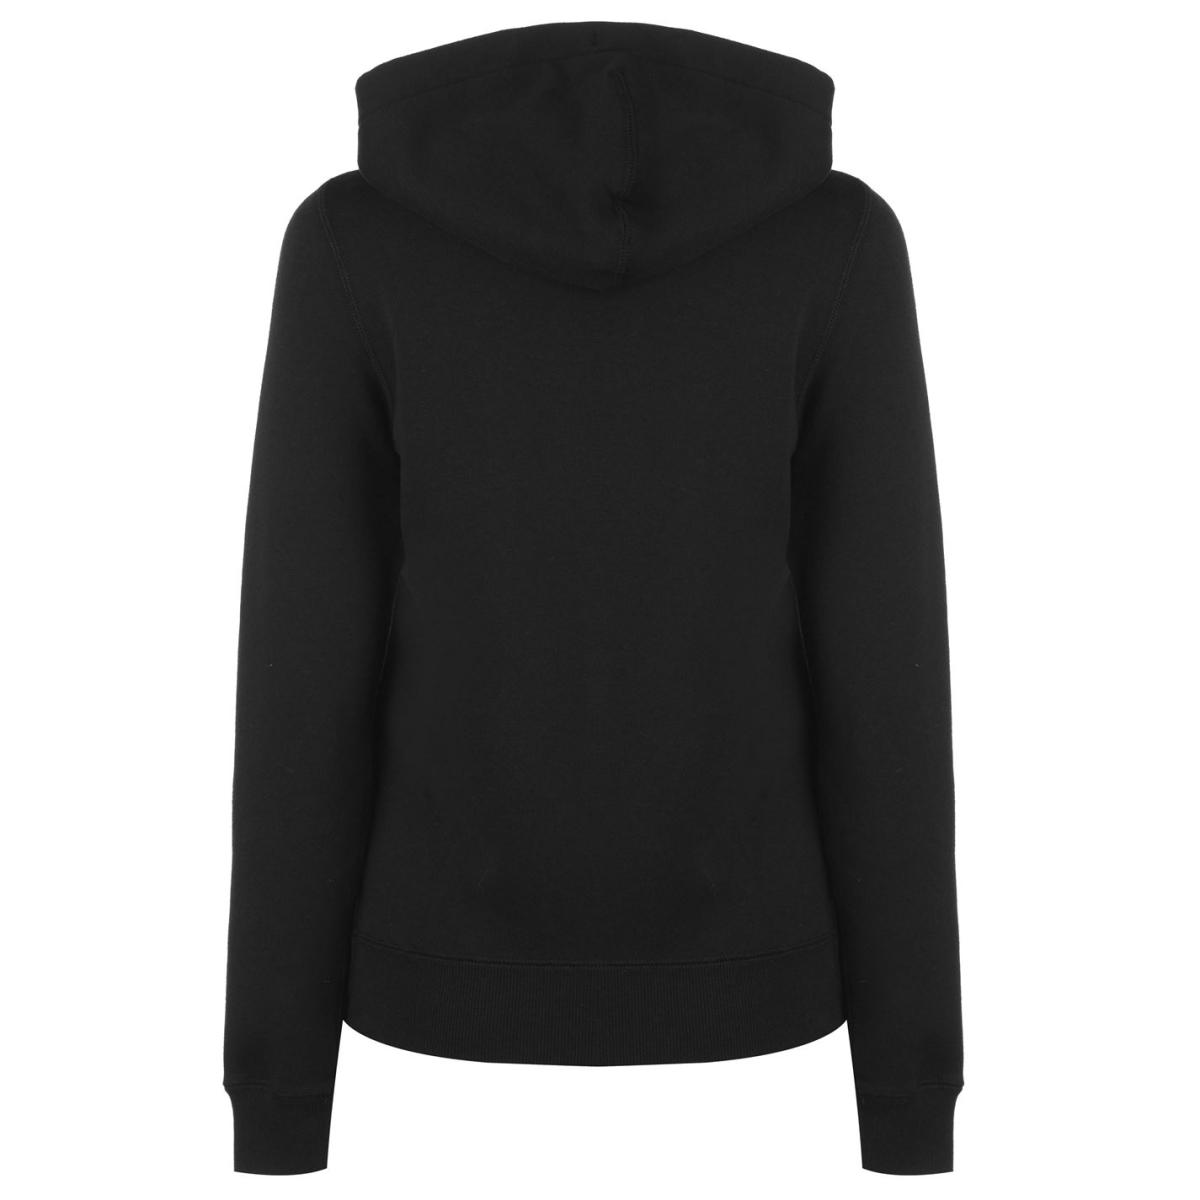 Converse Damen Kapuzenpullover Pullover Sweatshirt Kapuzenjacke OTH Chuck 3